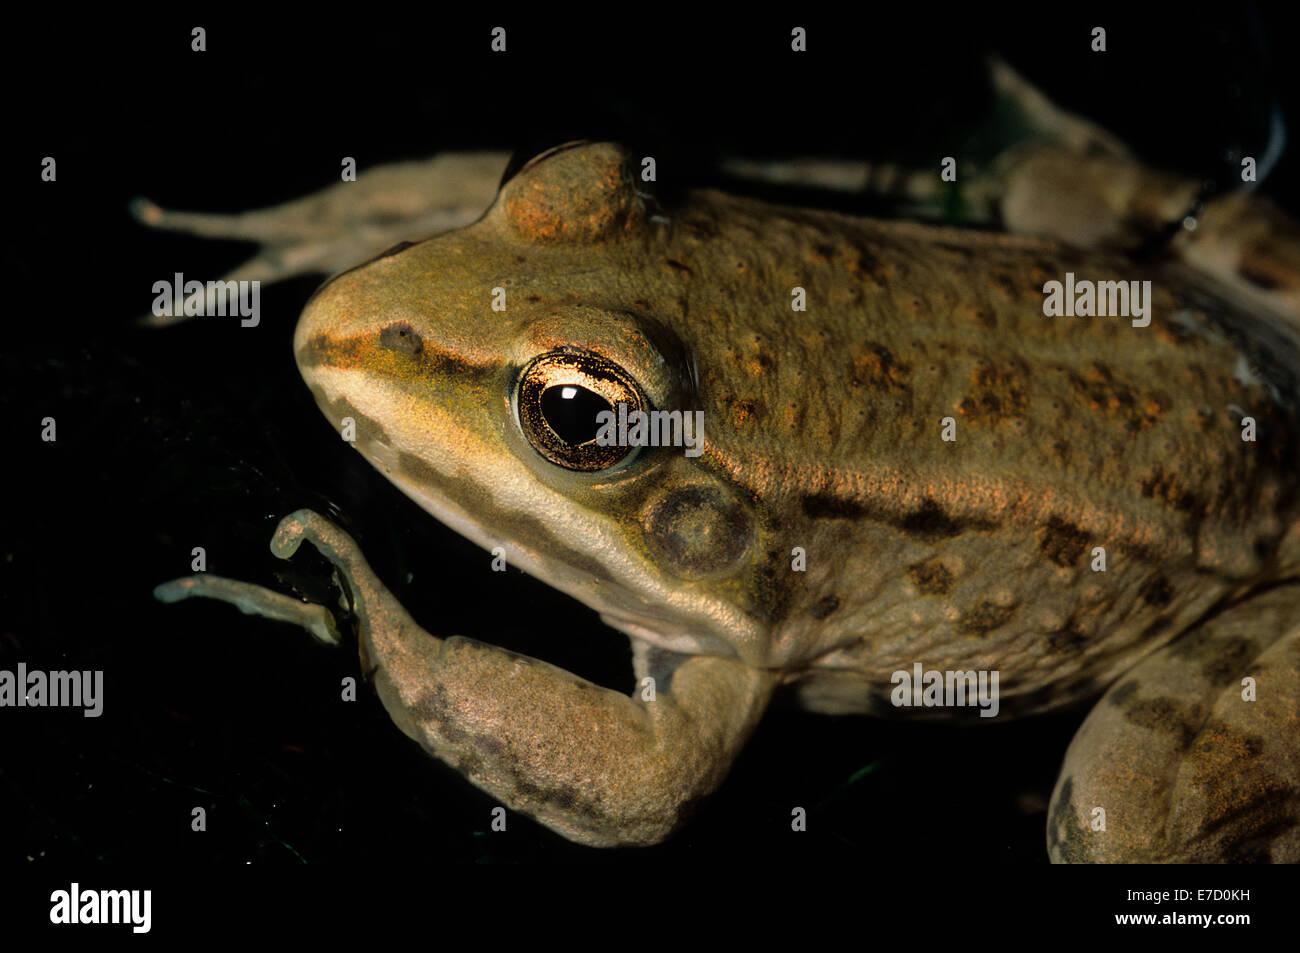 Green frog Rana esculenta, Ranidae, Amphibia, Anura, Formello, Lazio, Italy - Stock Image